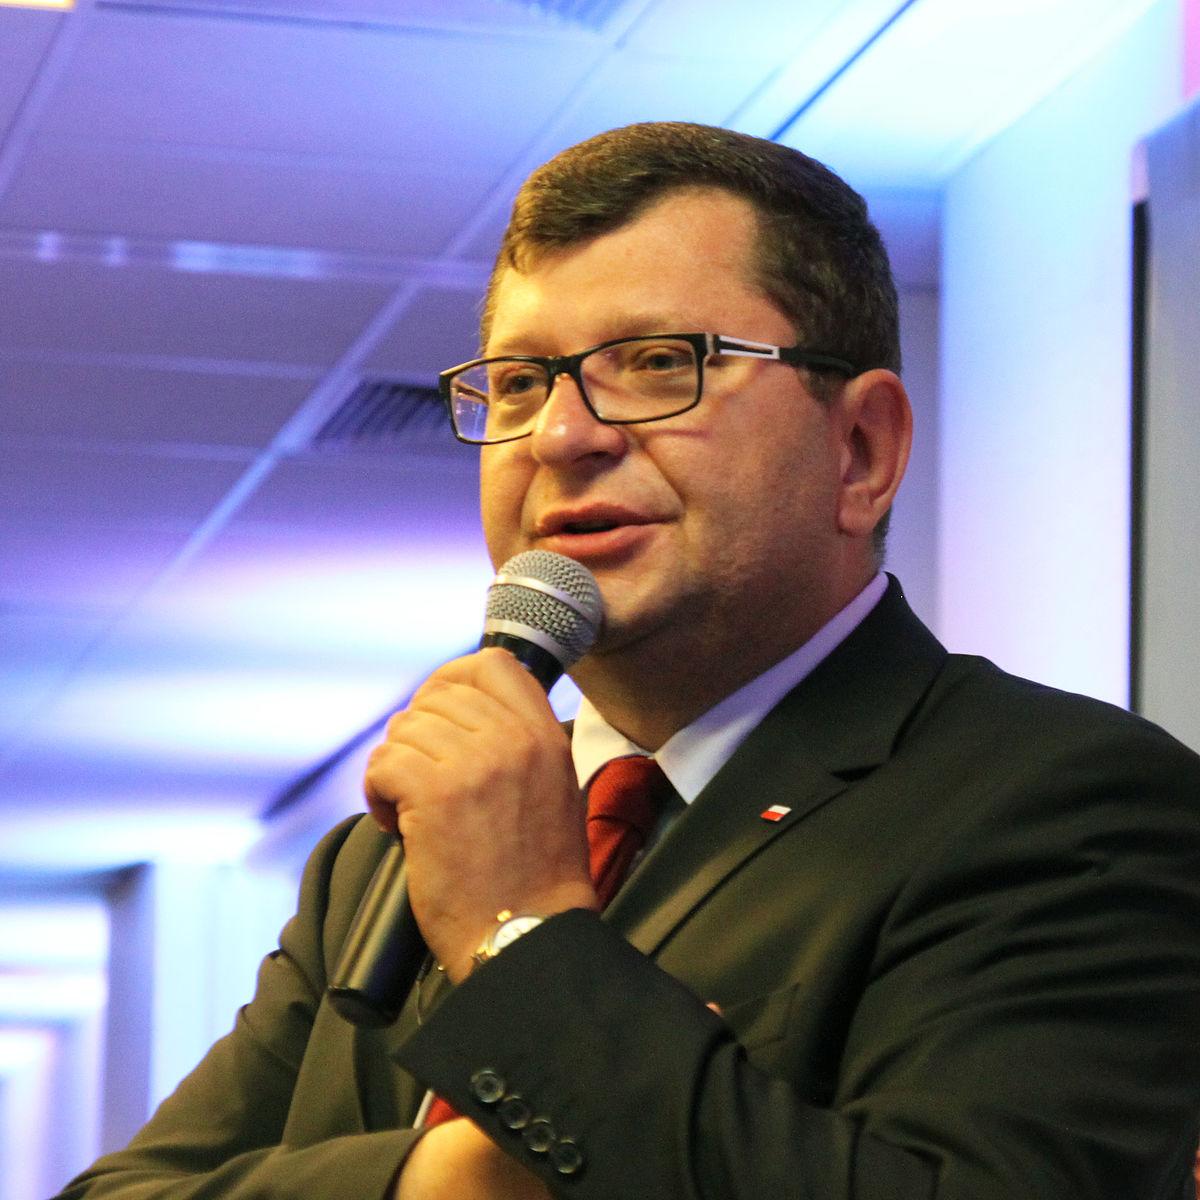 Zbigniew Stonoga Nonsensopedia Polska Encyklopedia Humoru